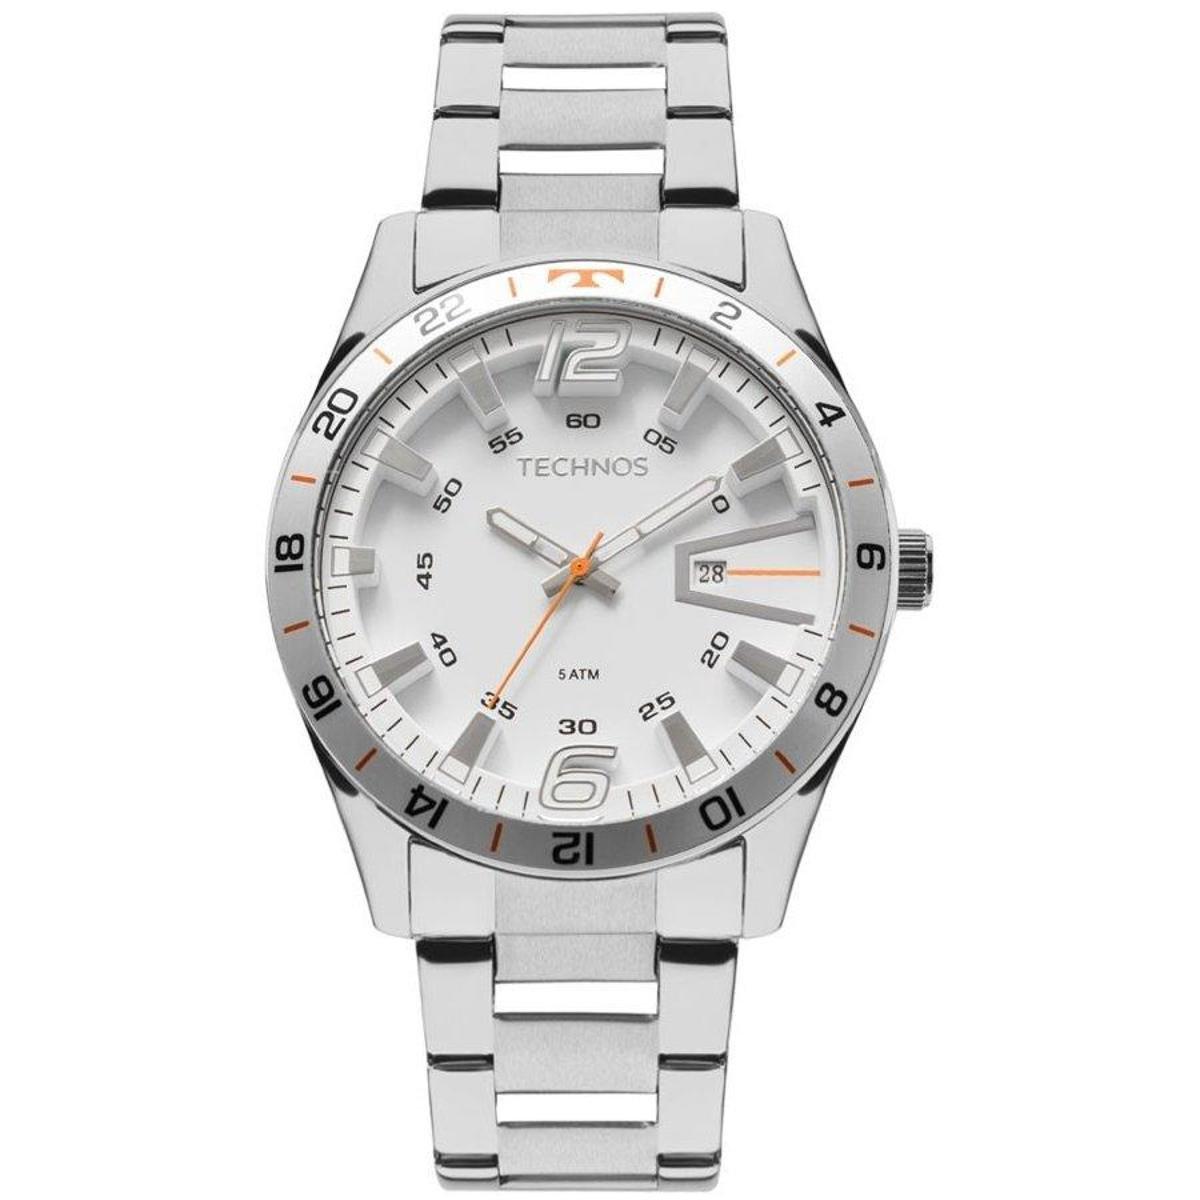 Relógio Technos Masculino 2115LAK 1B - Compre Agora   Netshoes d7f2dfd7f6